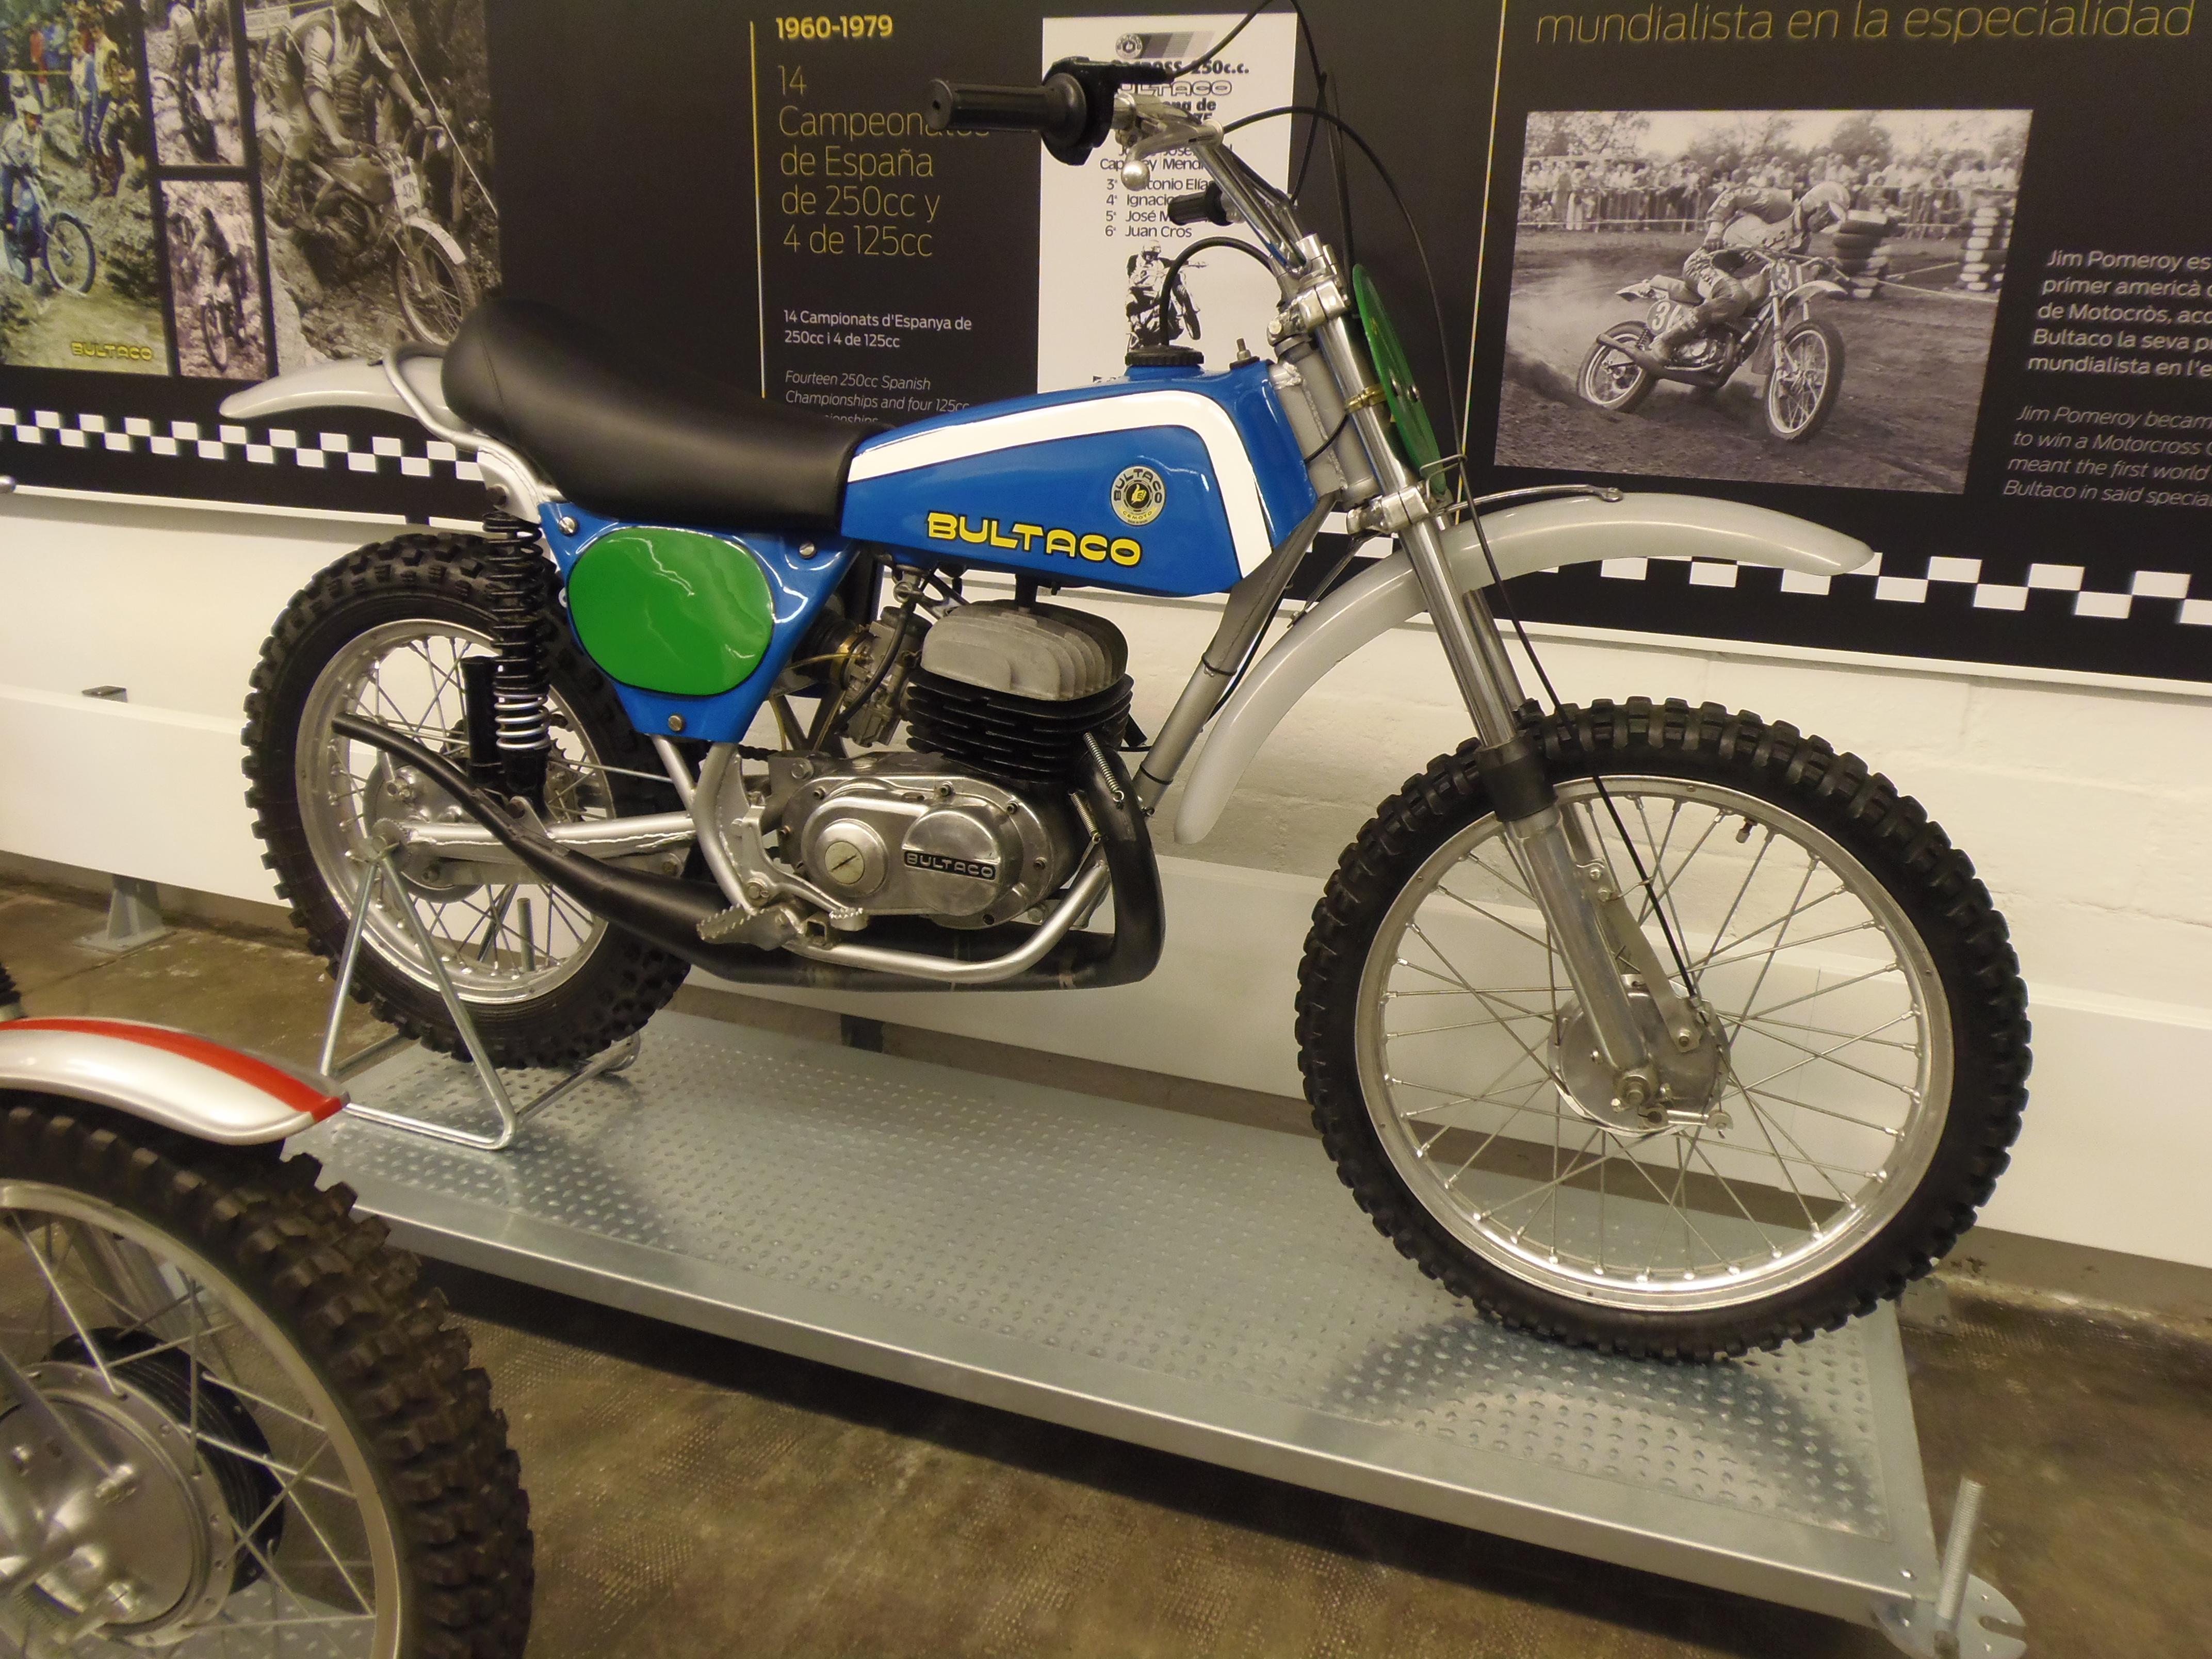 bultaco 125 pursang